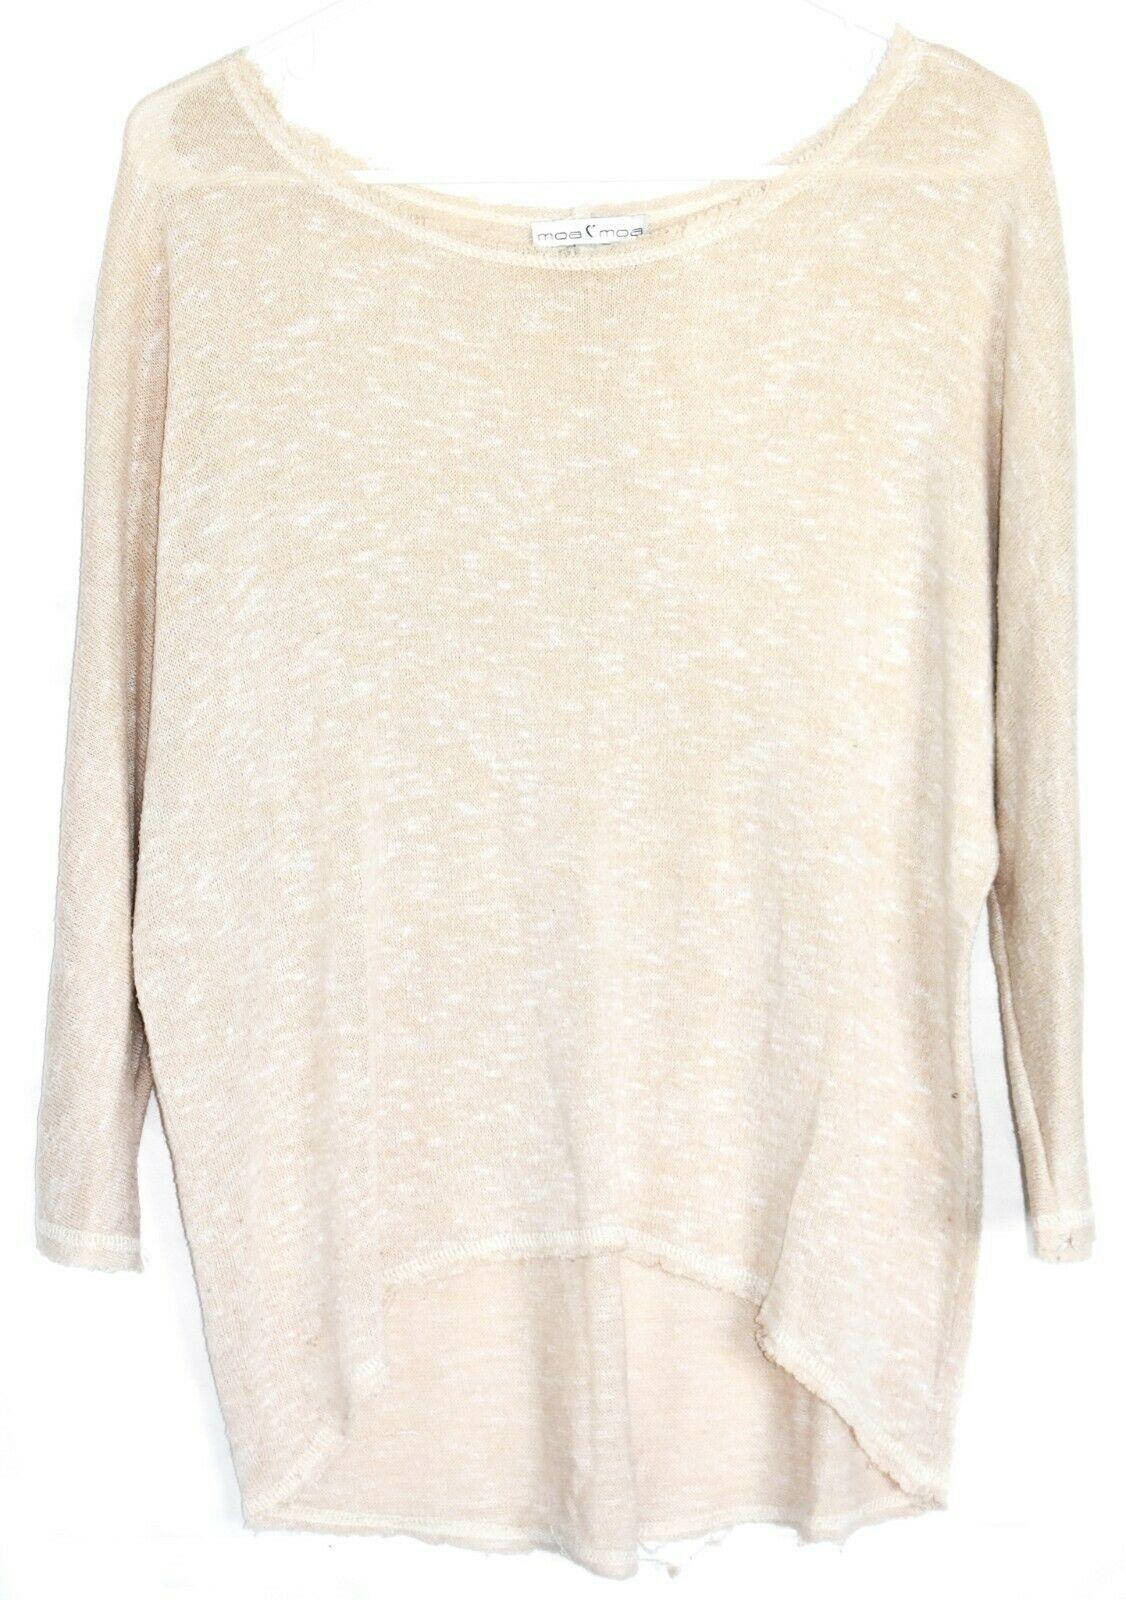 Moa Moa Taupe Tan Cream Textured Knit Long Sleeve Shirt Size S